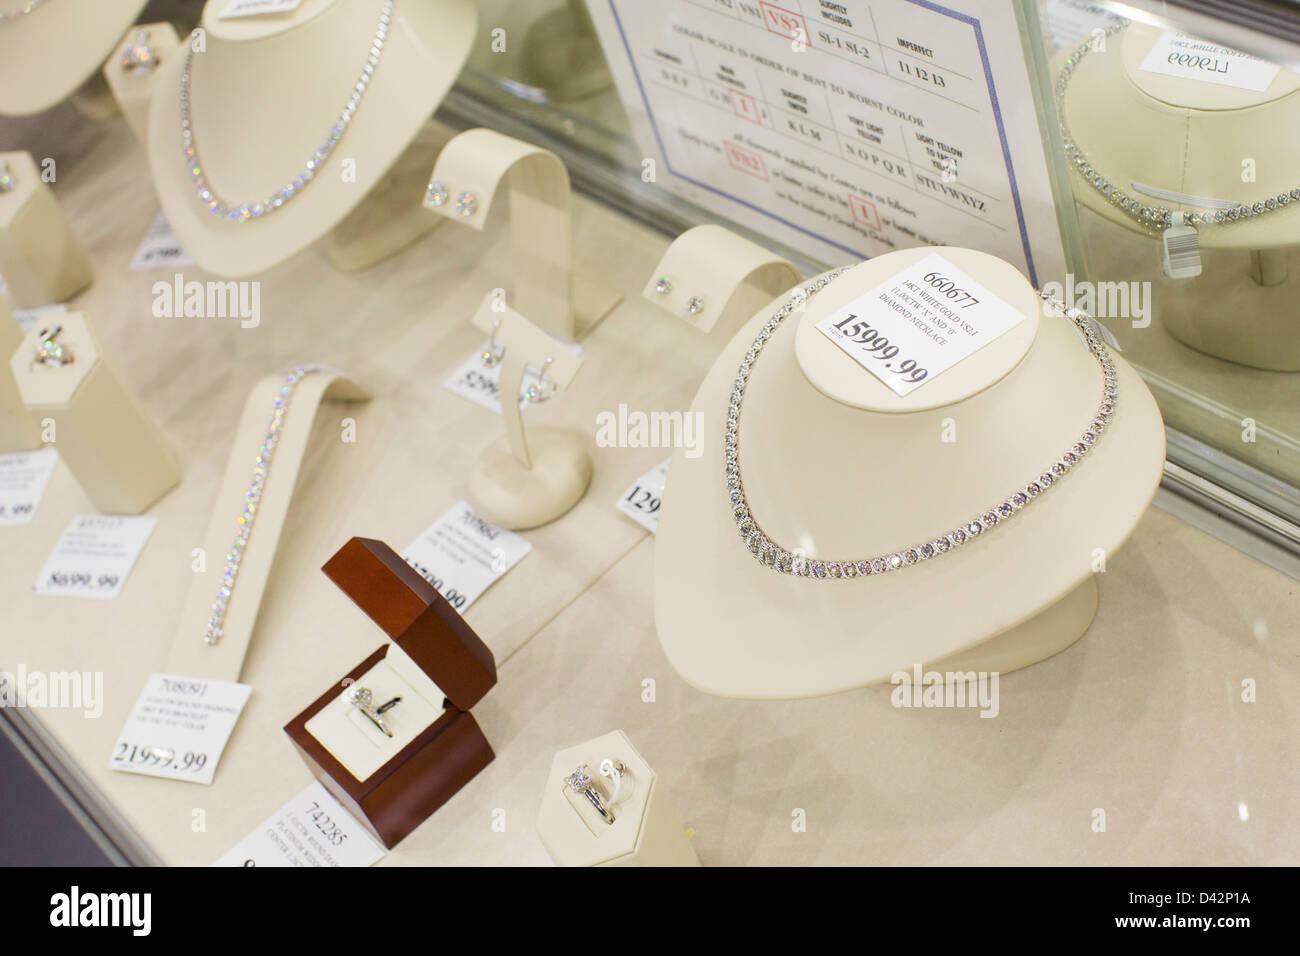 Diamond jewelry on display at a Costco Wholesale Warehouse Club. - Stock Image